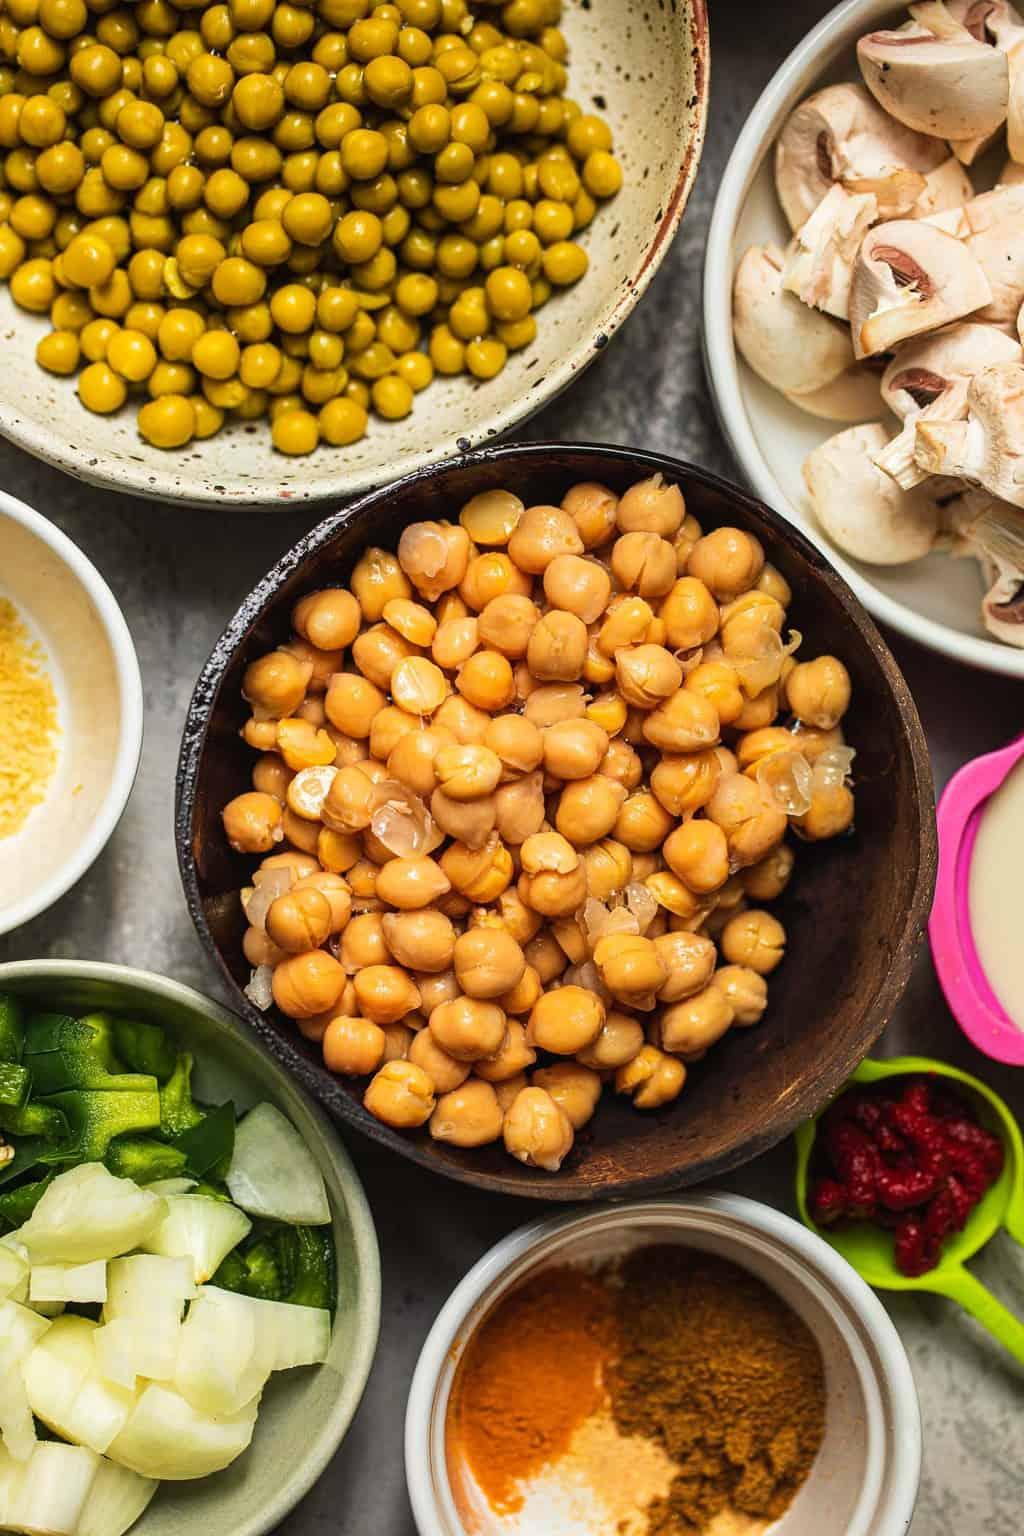 Ingredients for vegan chickpea pasta